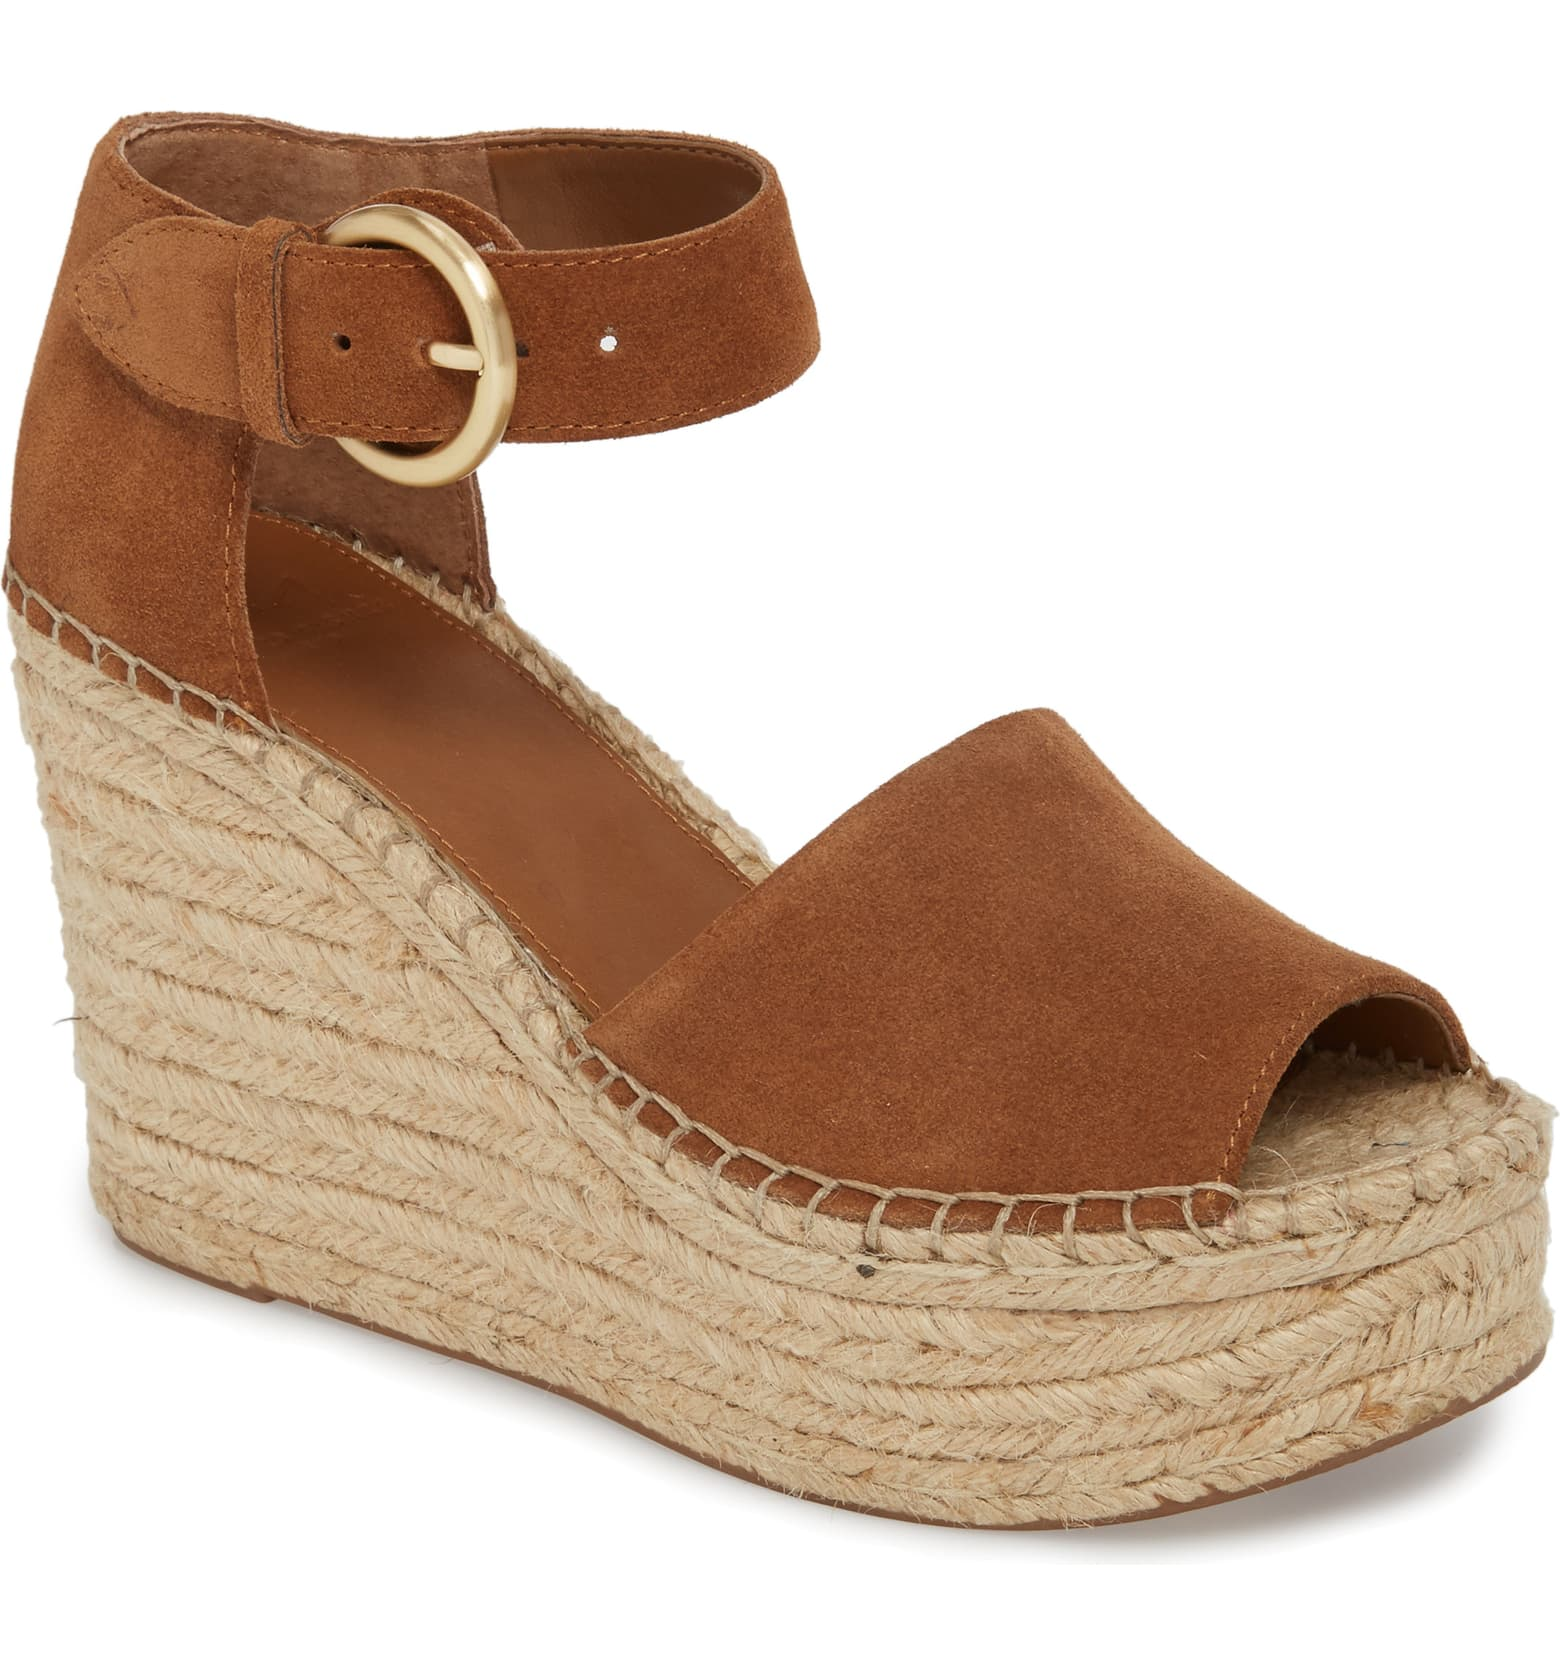 platform_sandals.jpg